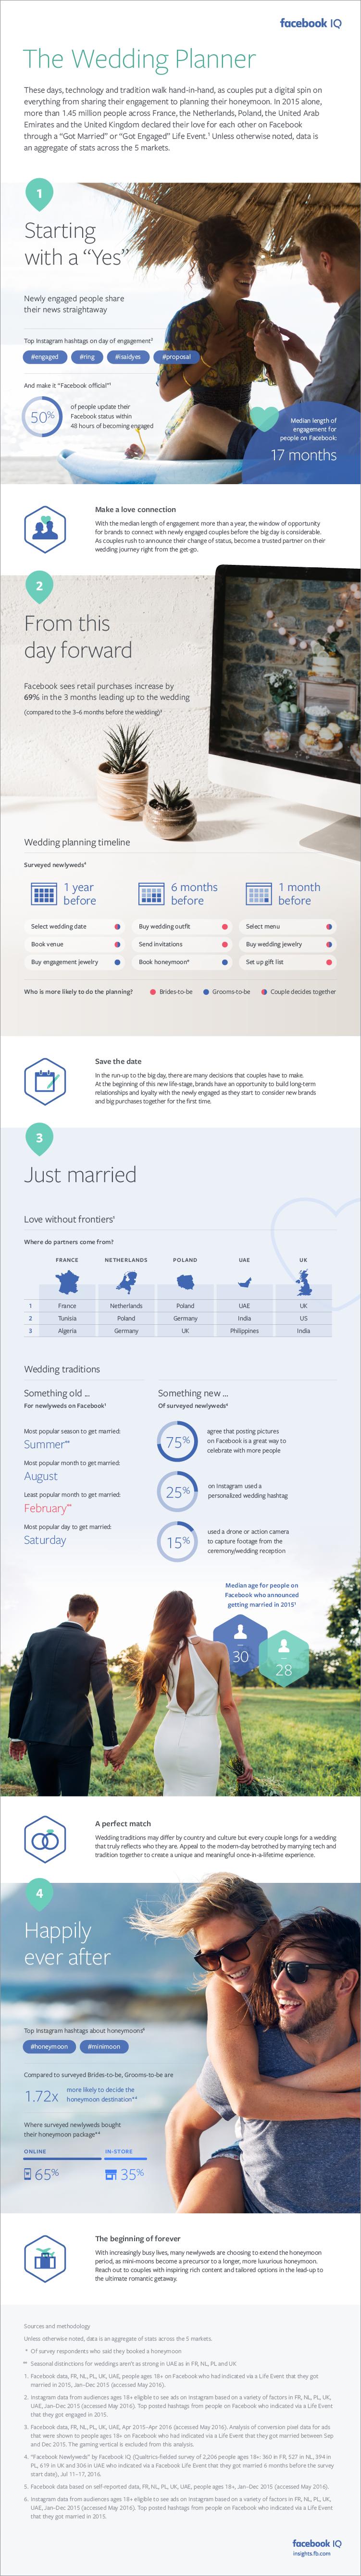 facebook en trouwen